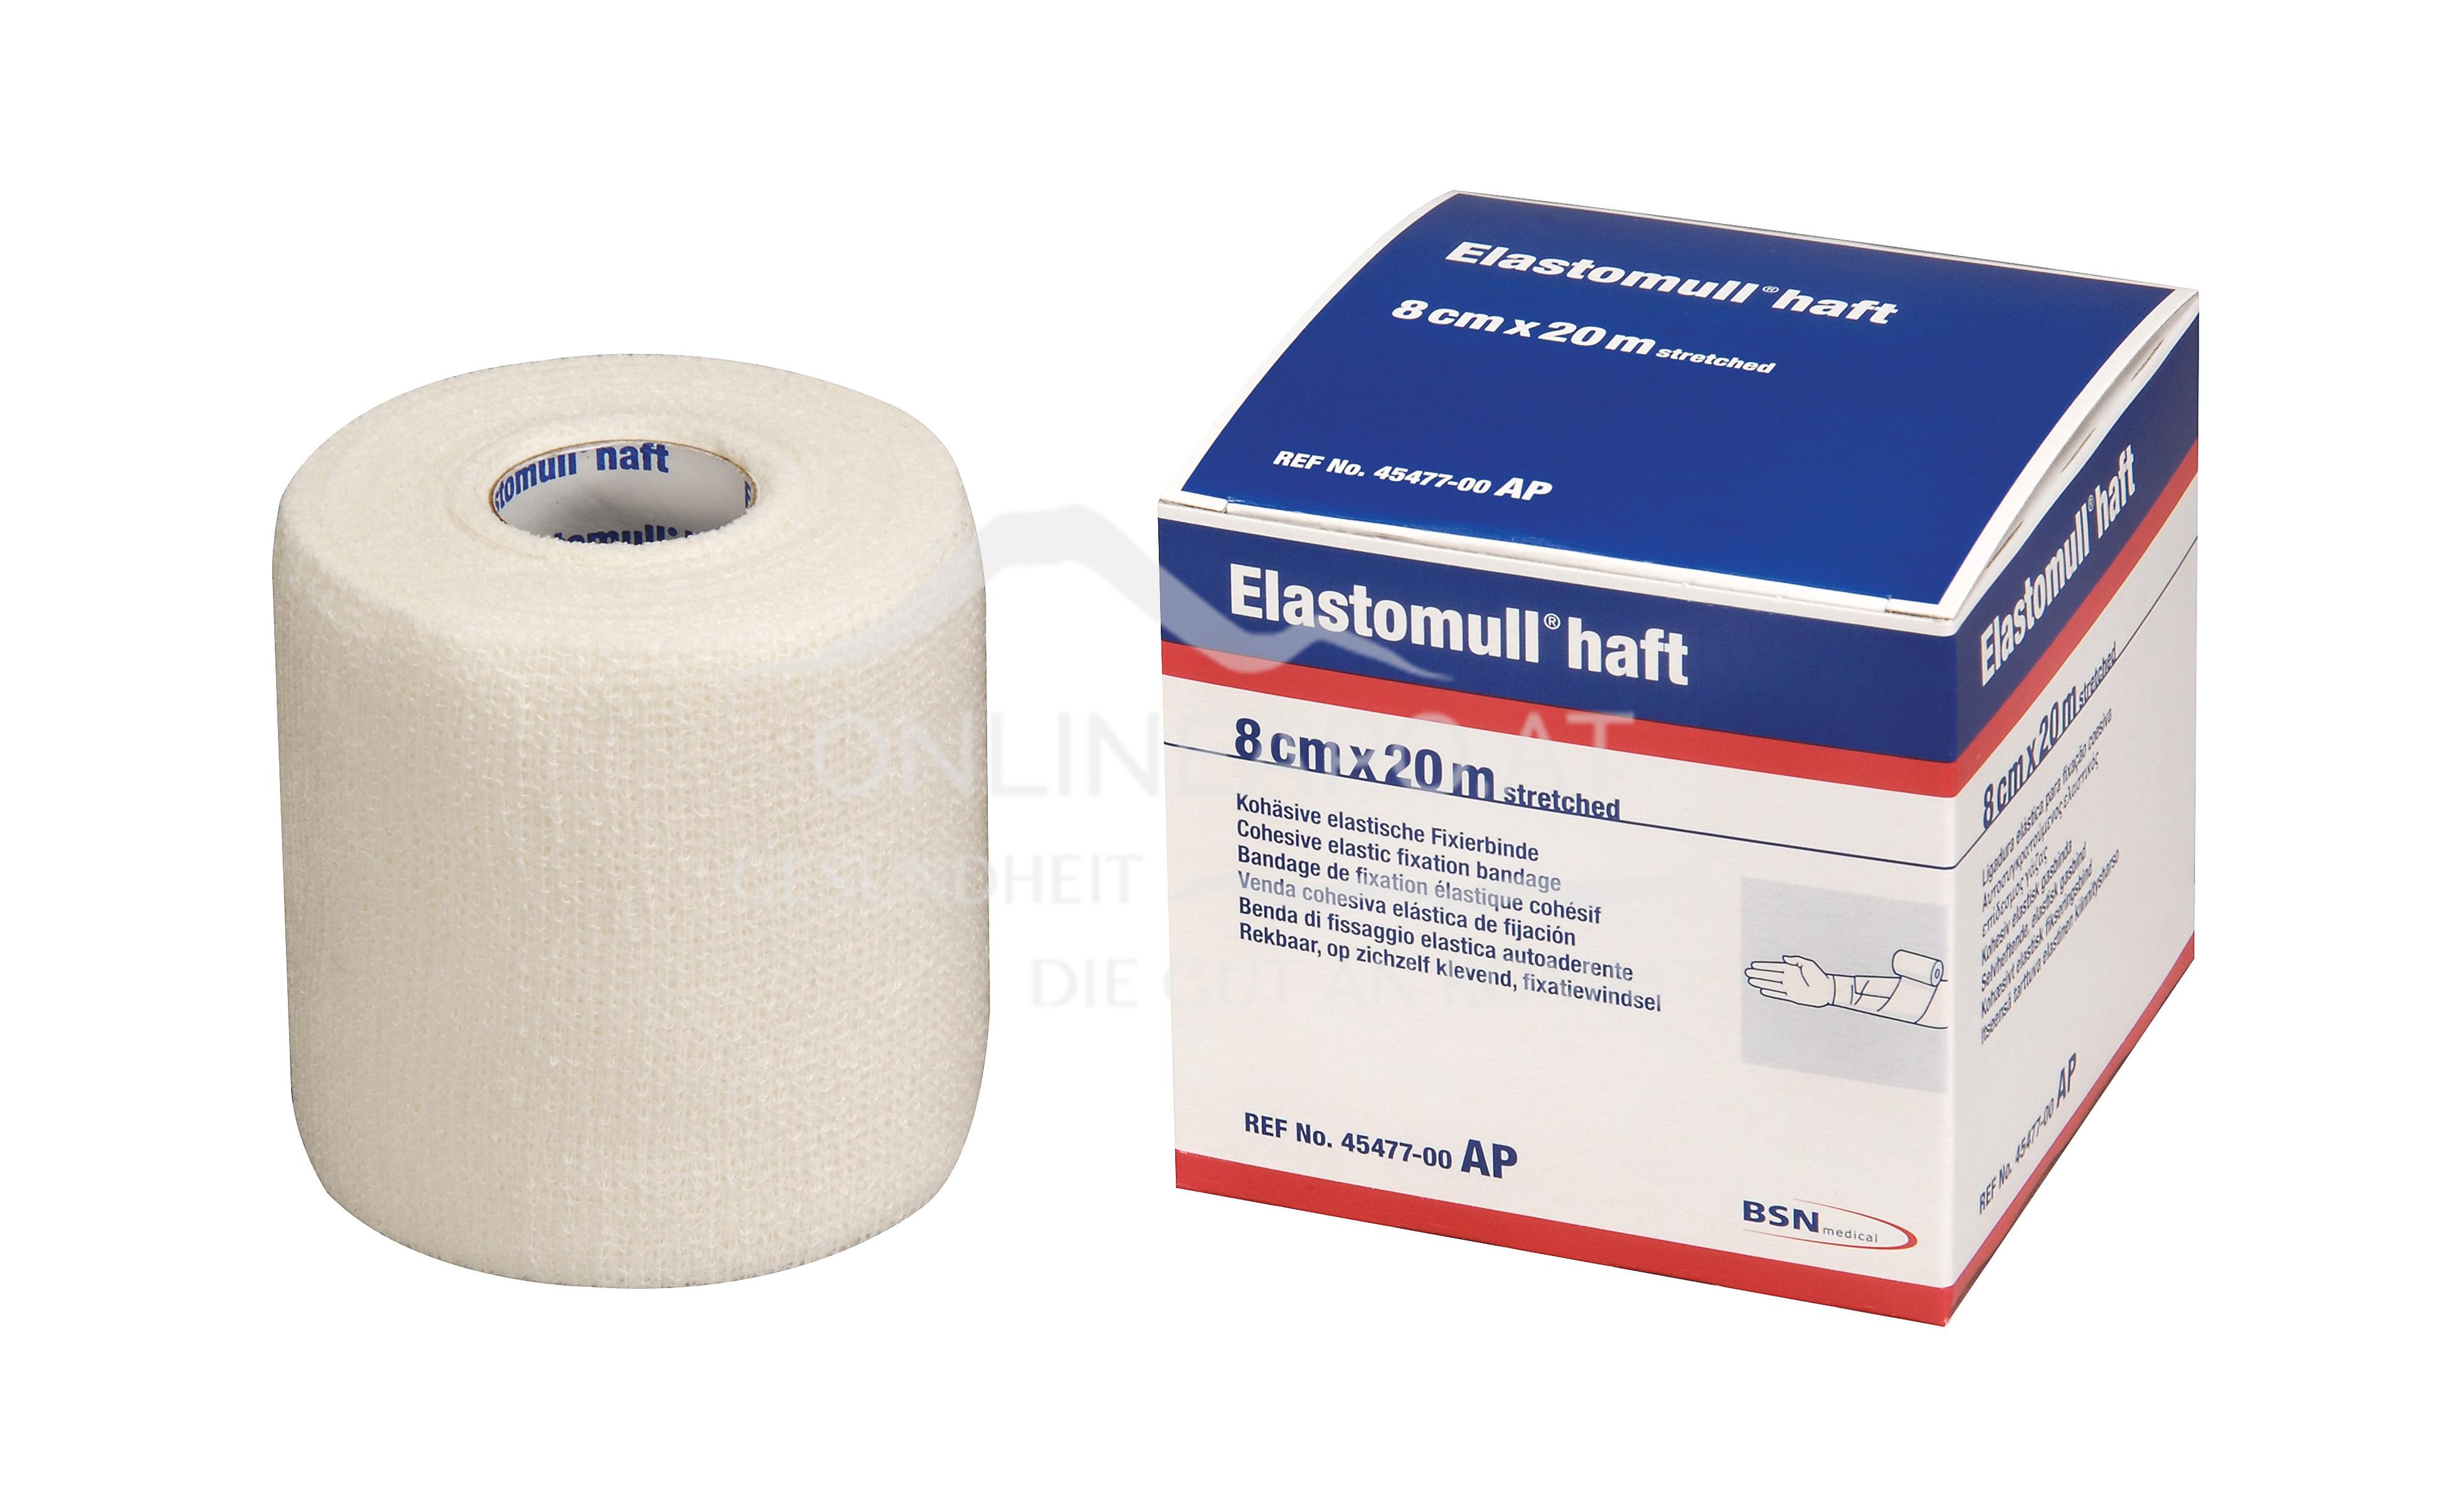 Elastomull® haft 8cm x 20m